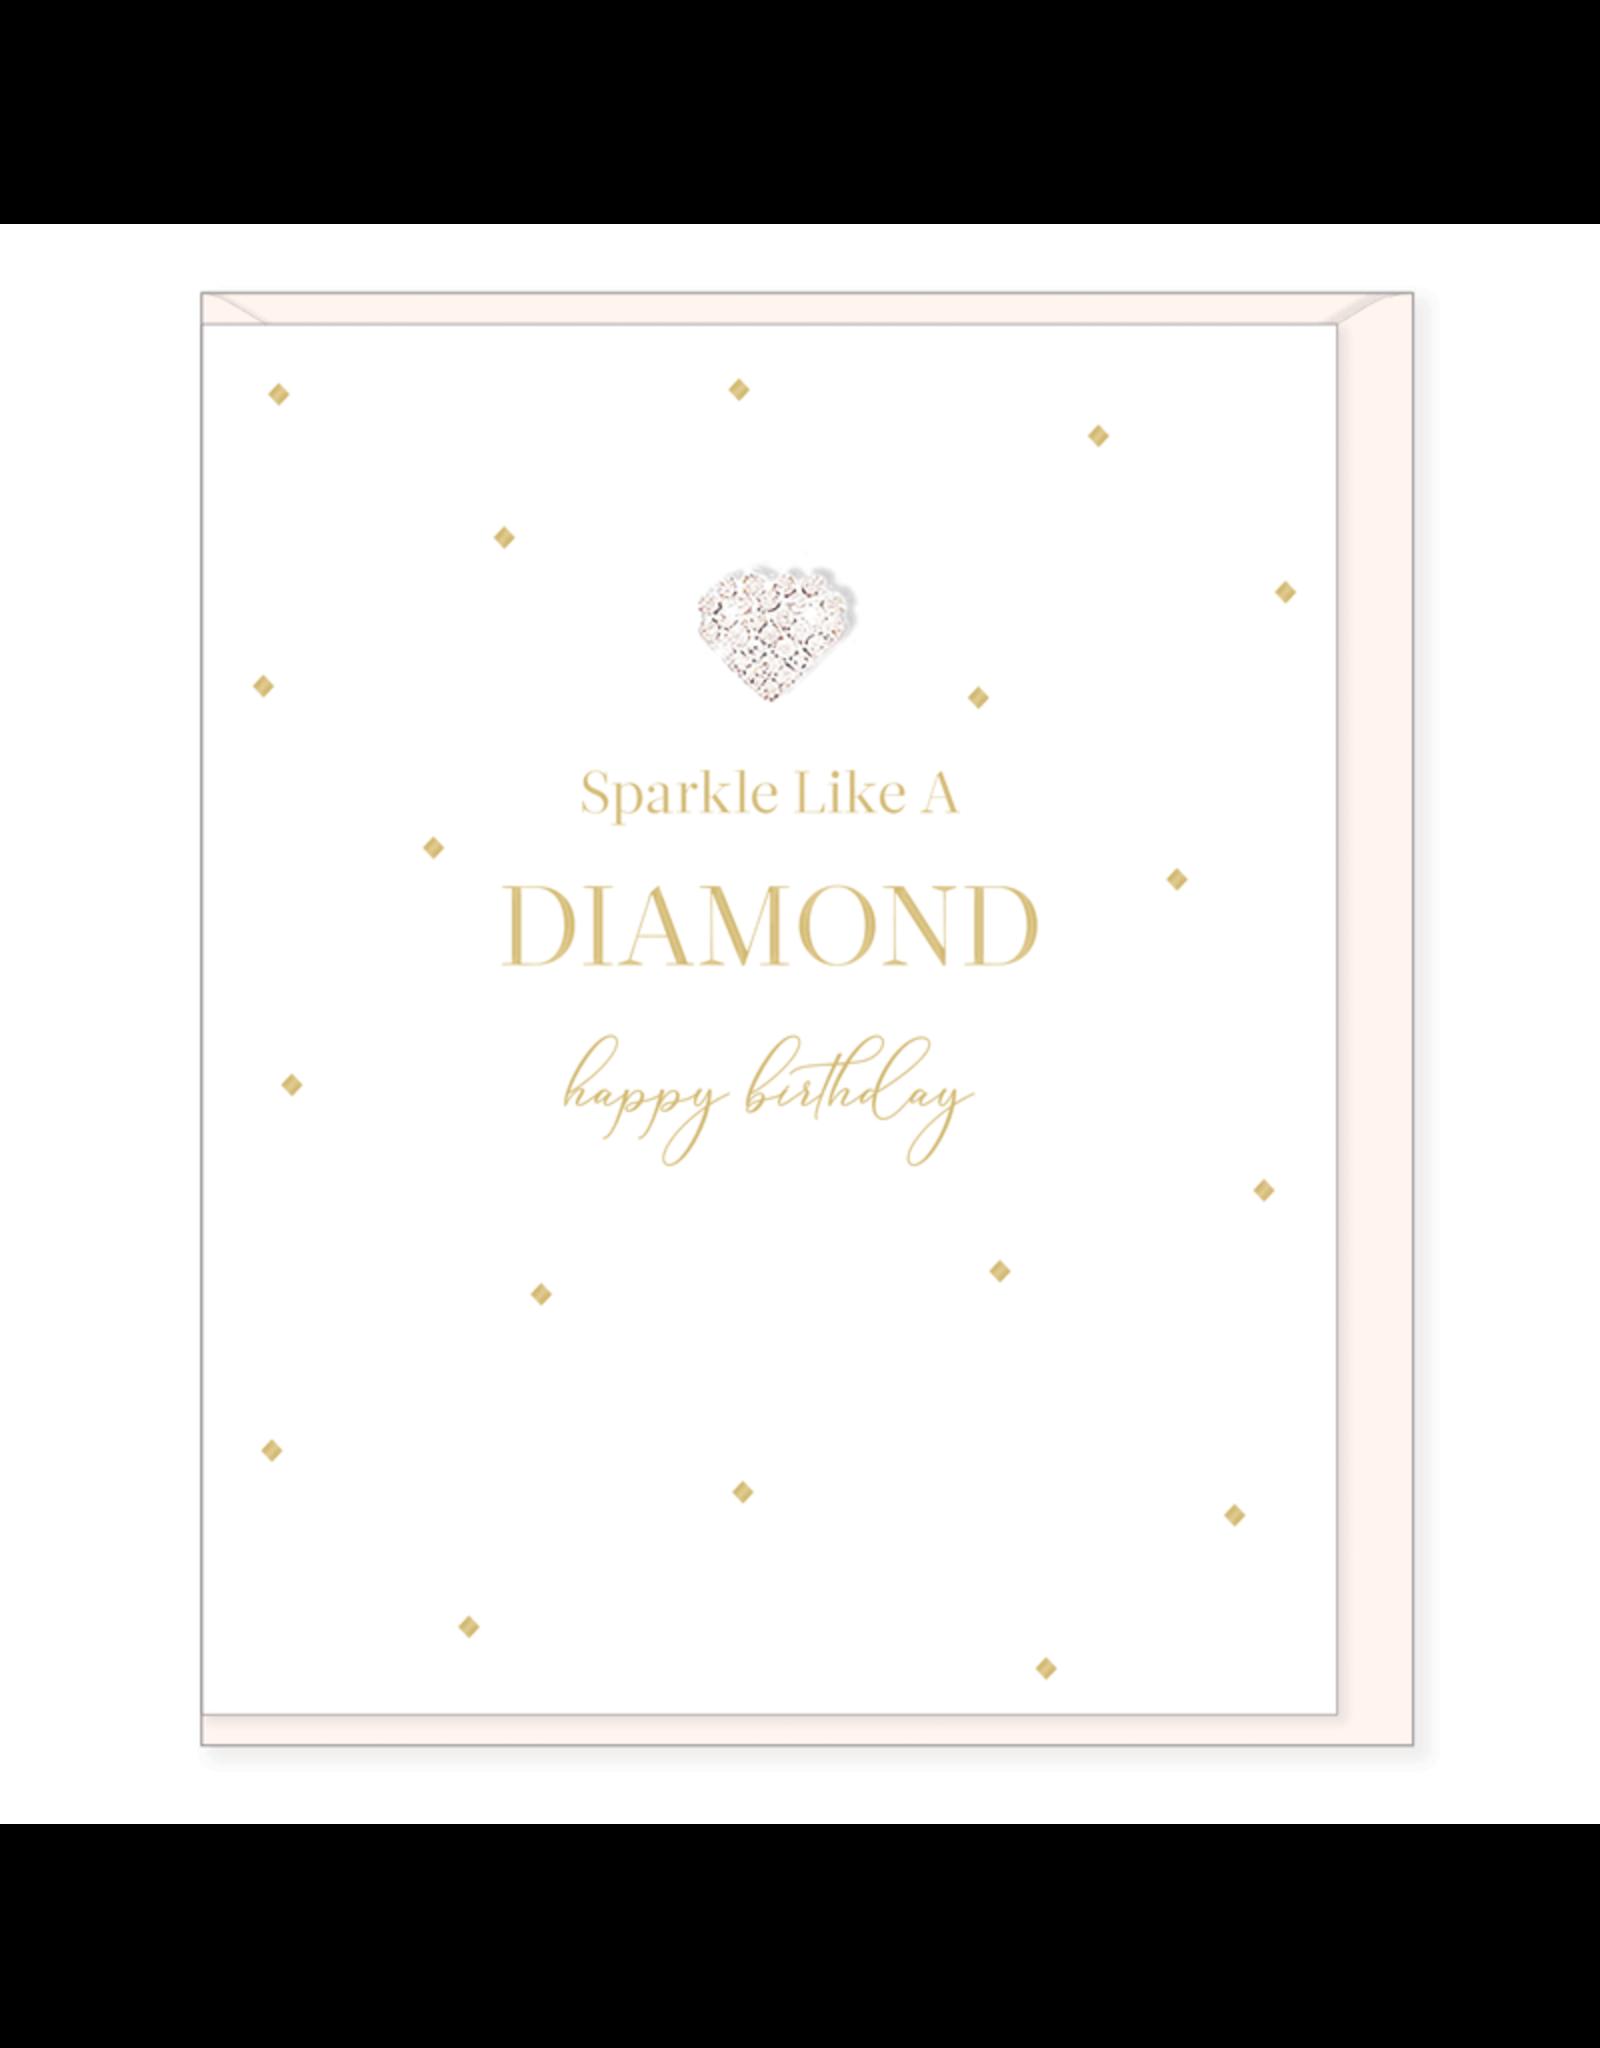 Hearts Design Wenskaart - Sparkle Like a Diamond